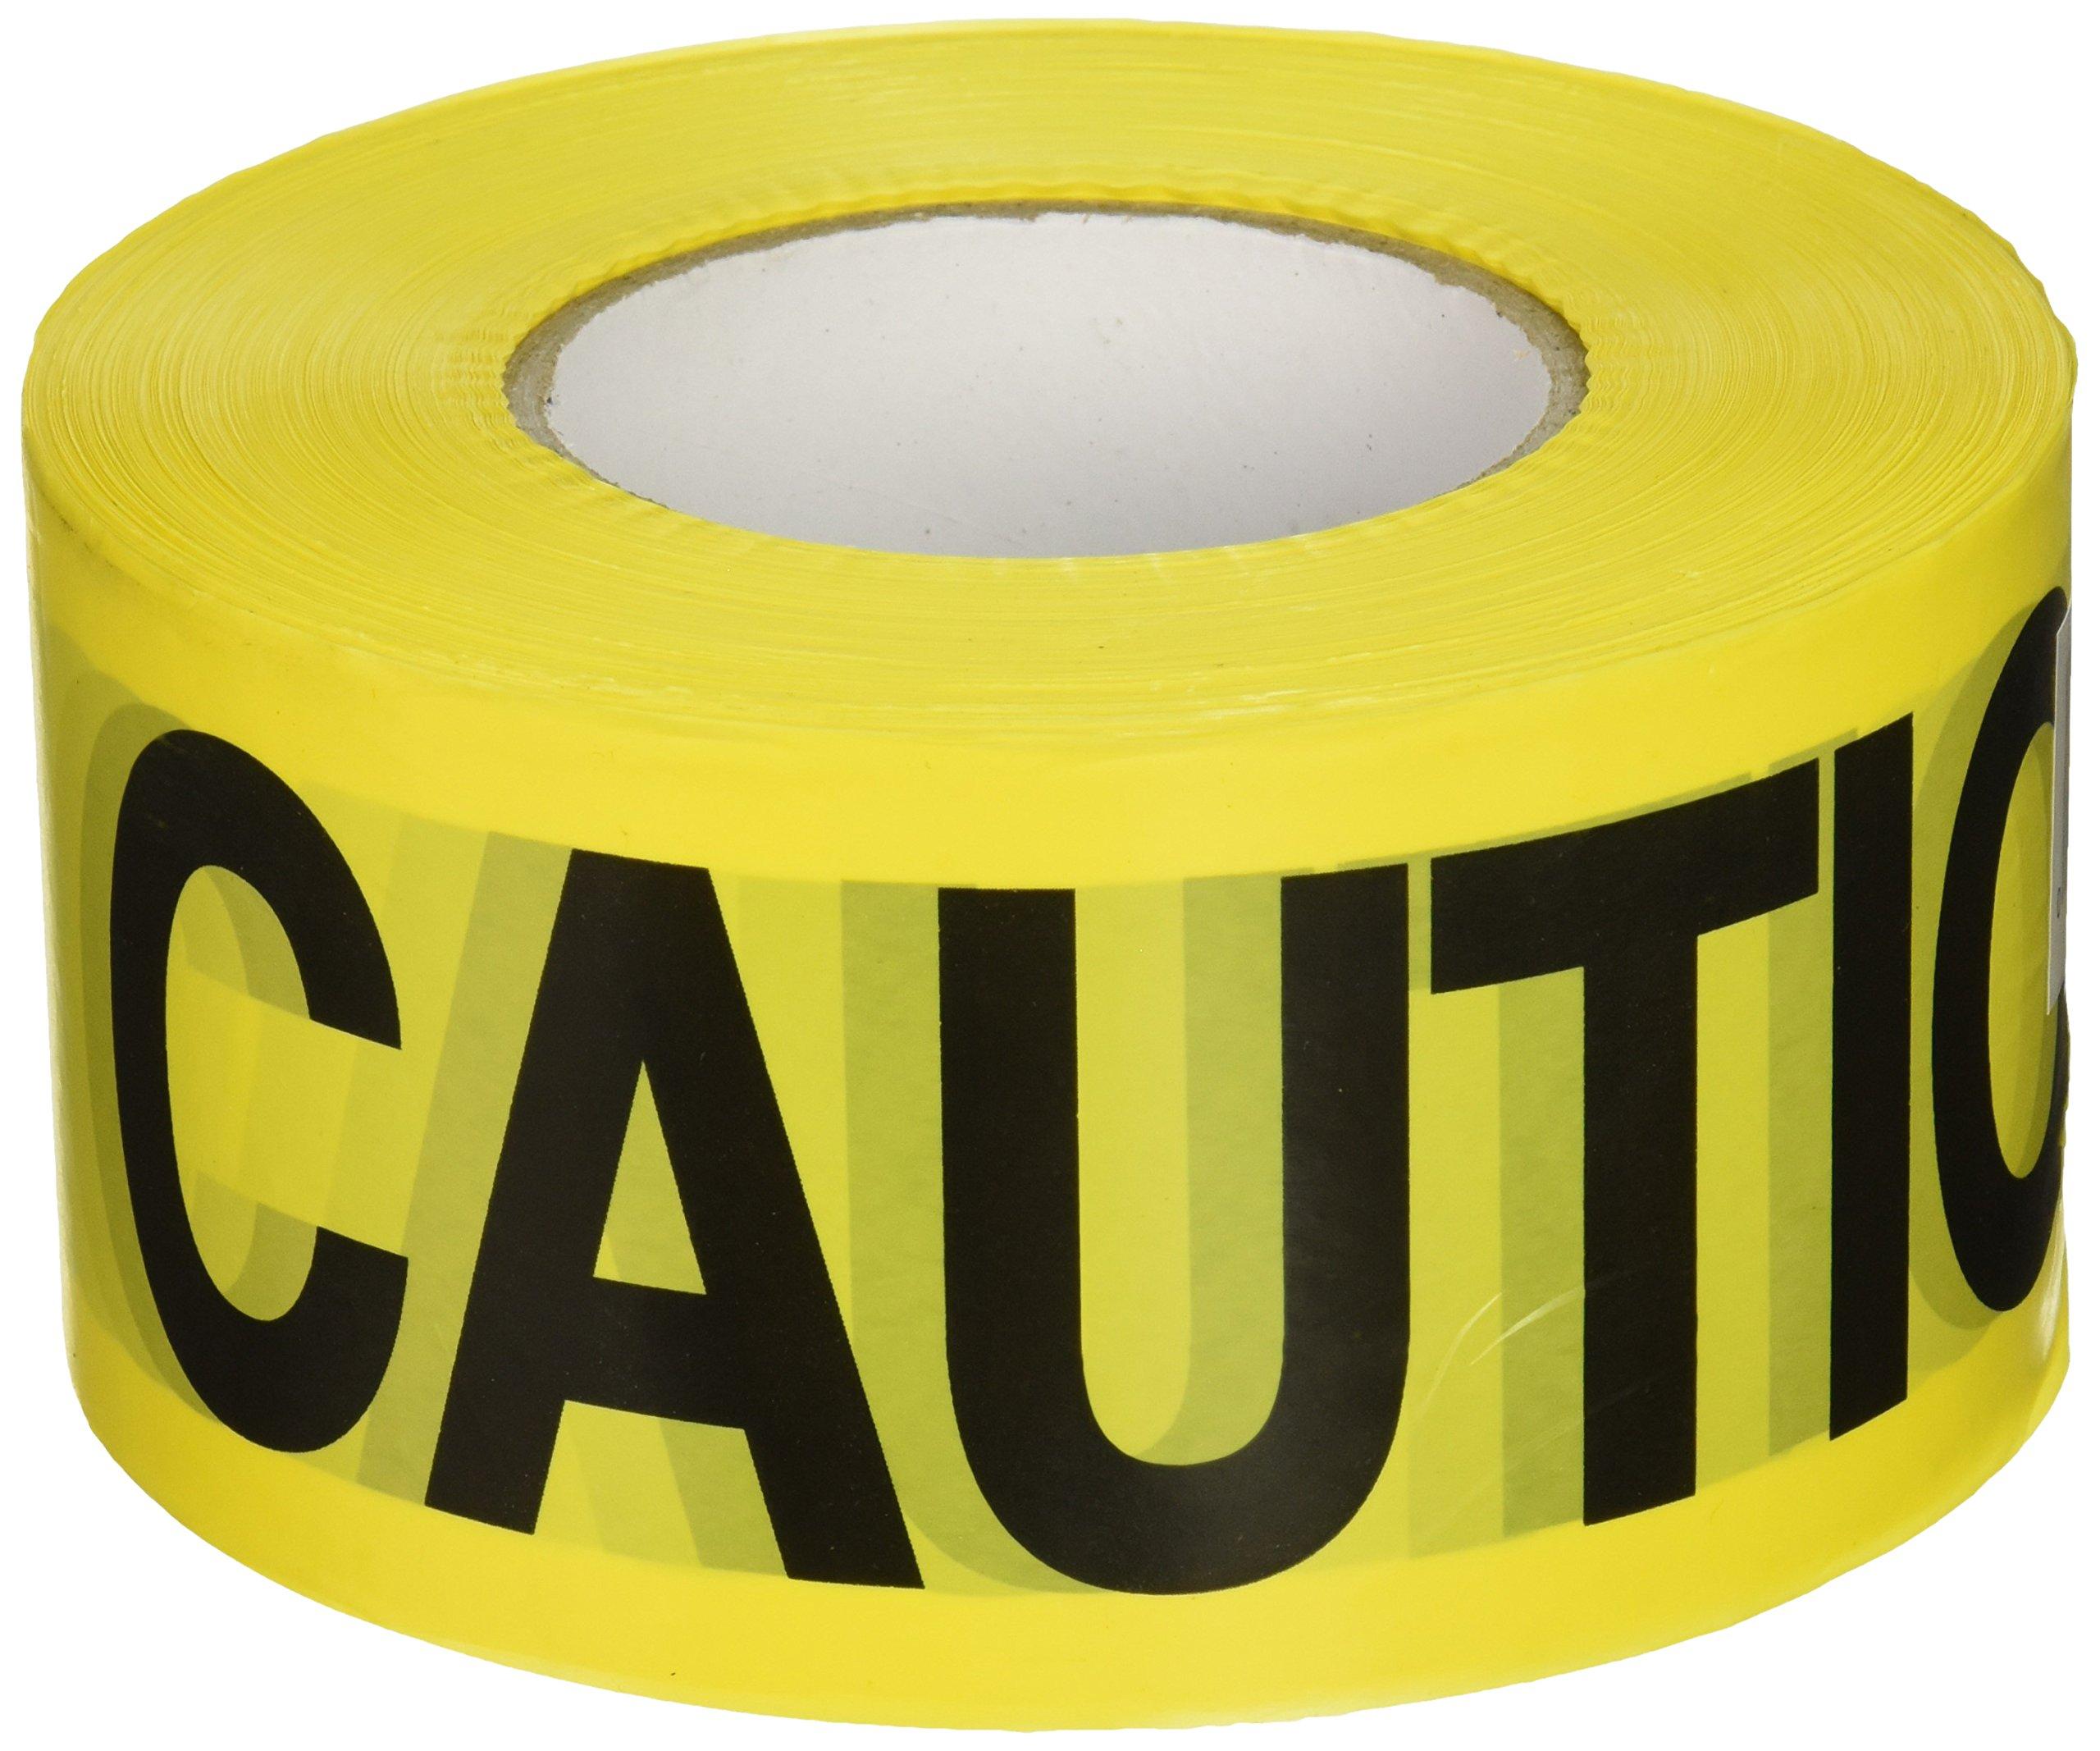 CH Hanson 1000 ft. Caution Caution Barricade Tape 2 mil by CH Hanson